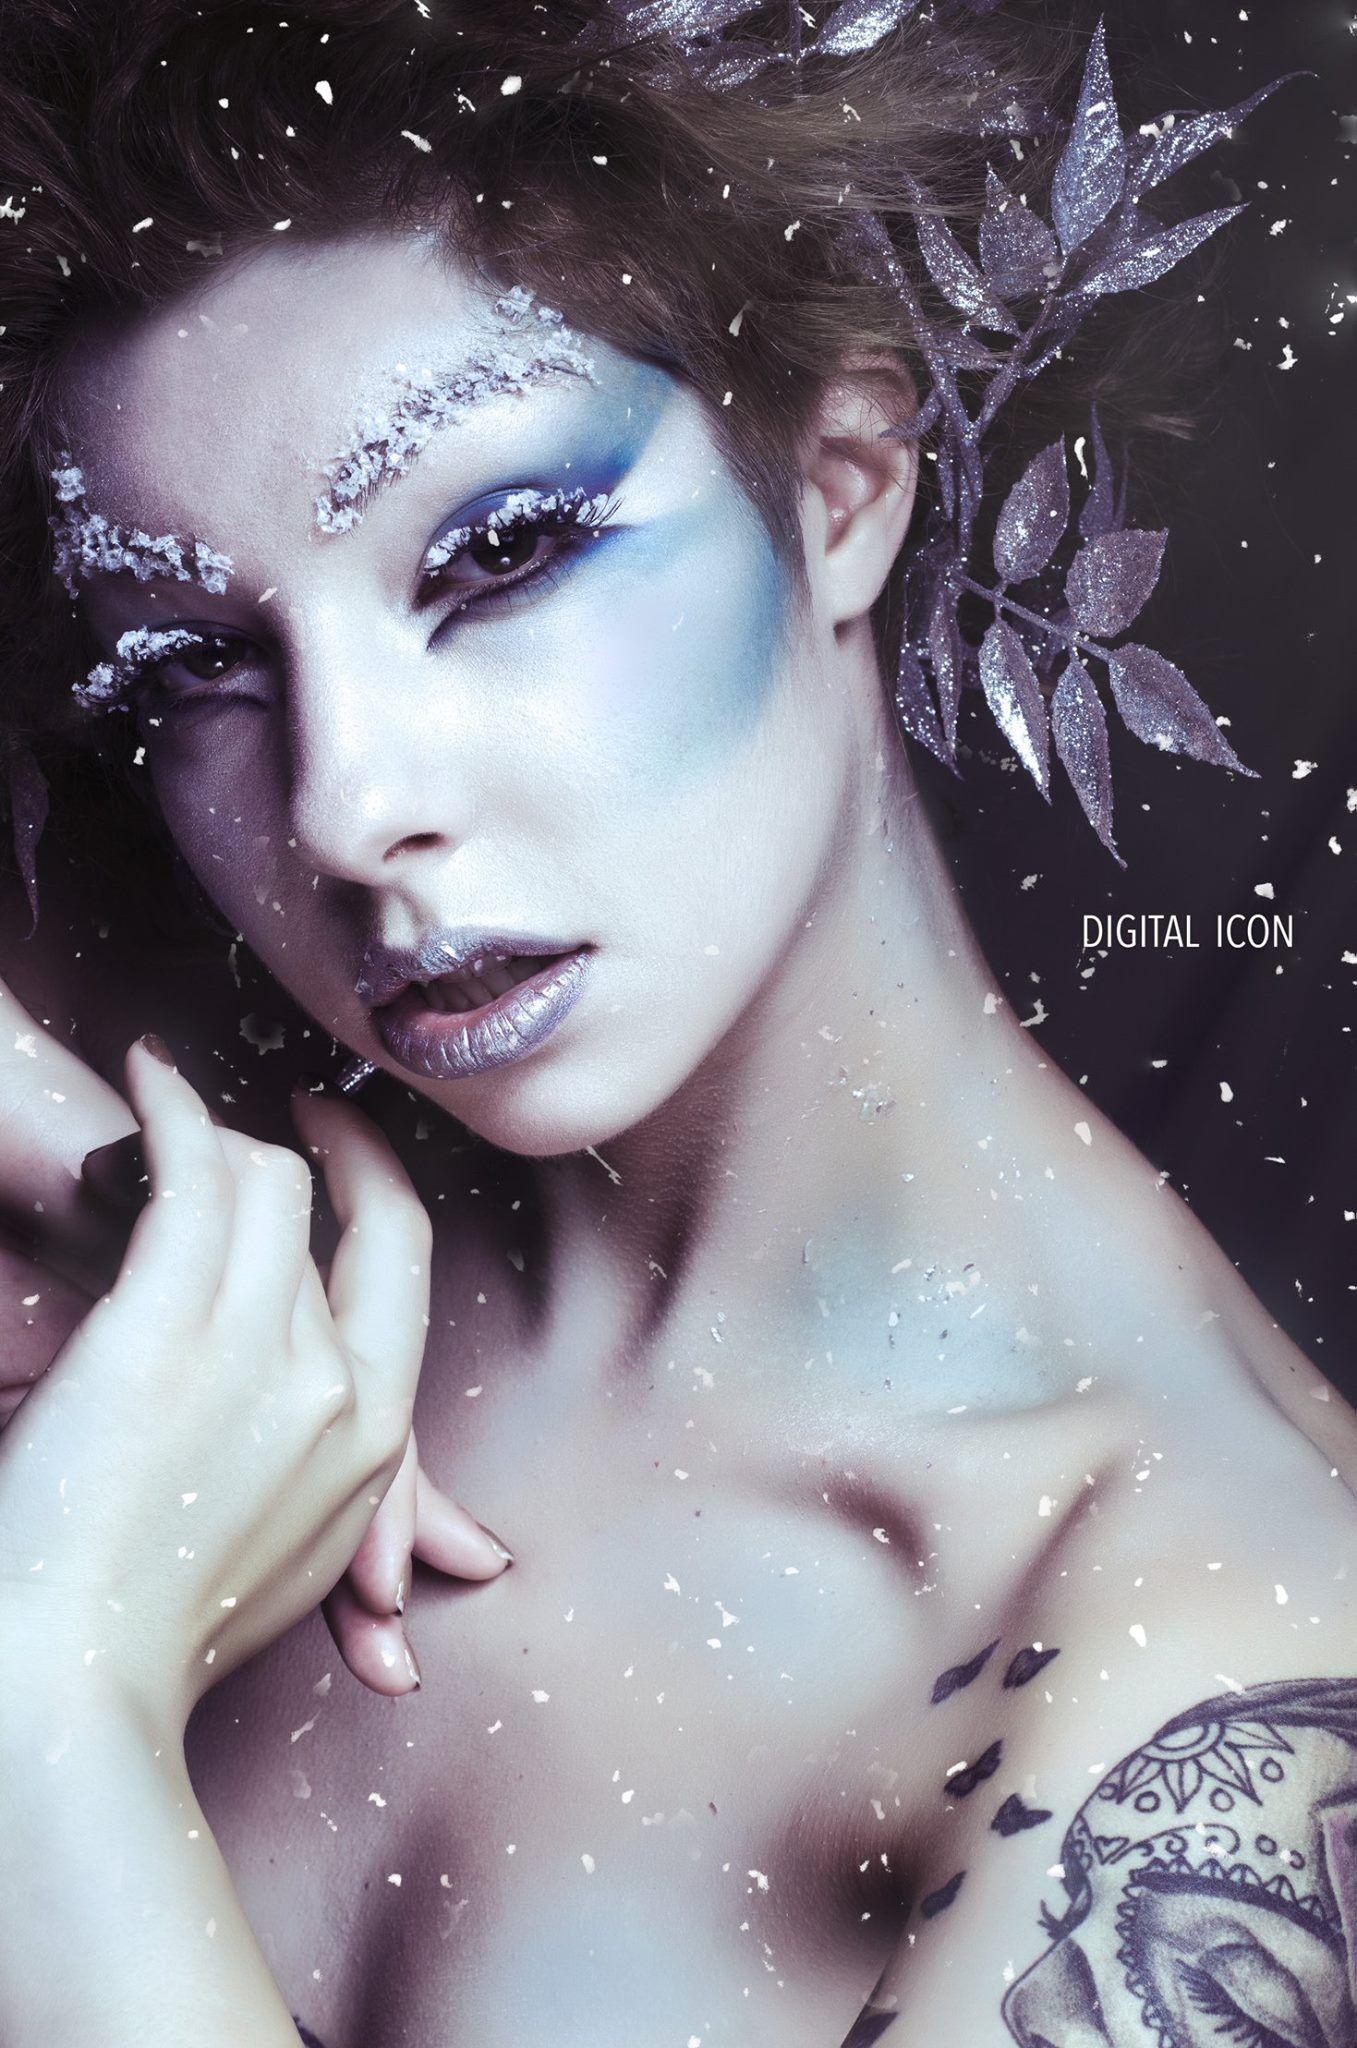 Veronica Fensel Makeup Artistry Digital Icon Photography model Jessie Hunter